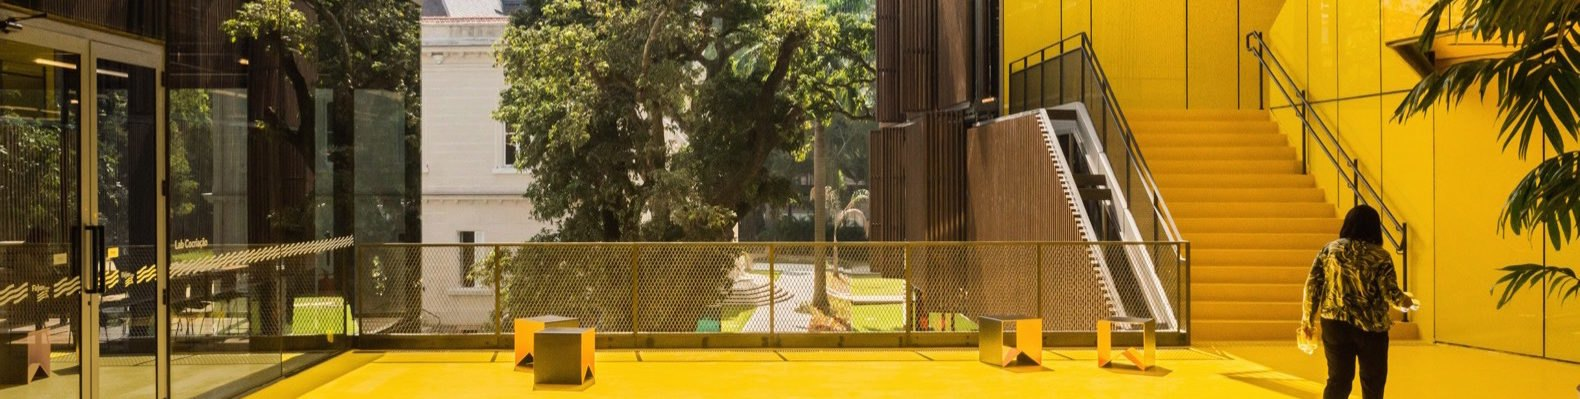 inhabitat galleryaward winning innovation center harnesses recycled rainwater and solar energy